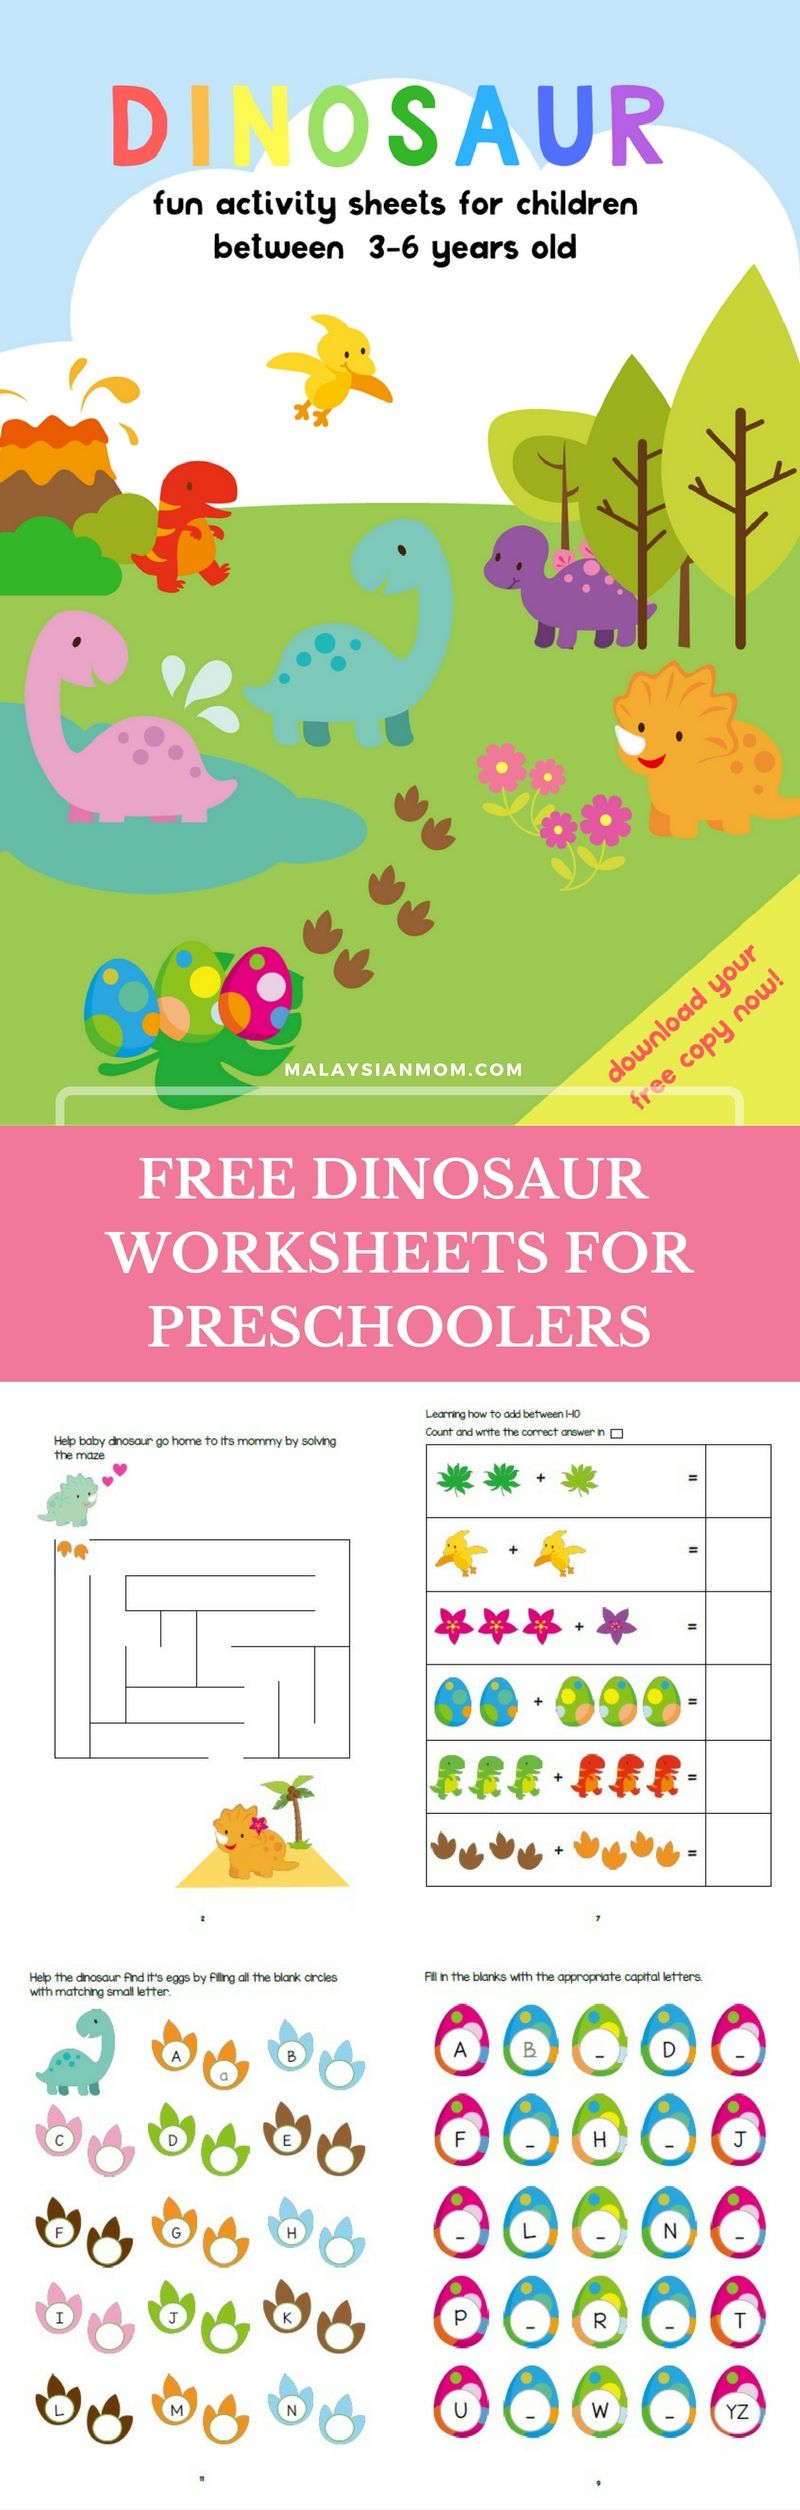 Dinosaur Preschool Printables   Activities   Worksheets for kindergarten    Party theme   DIY   Cute   mo…   Preschool fun [ 2510 x 800 Pixel ]